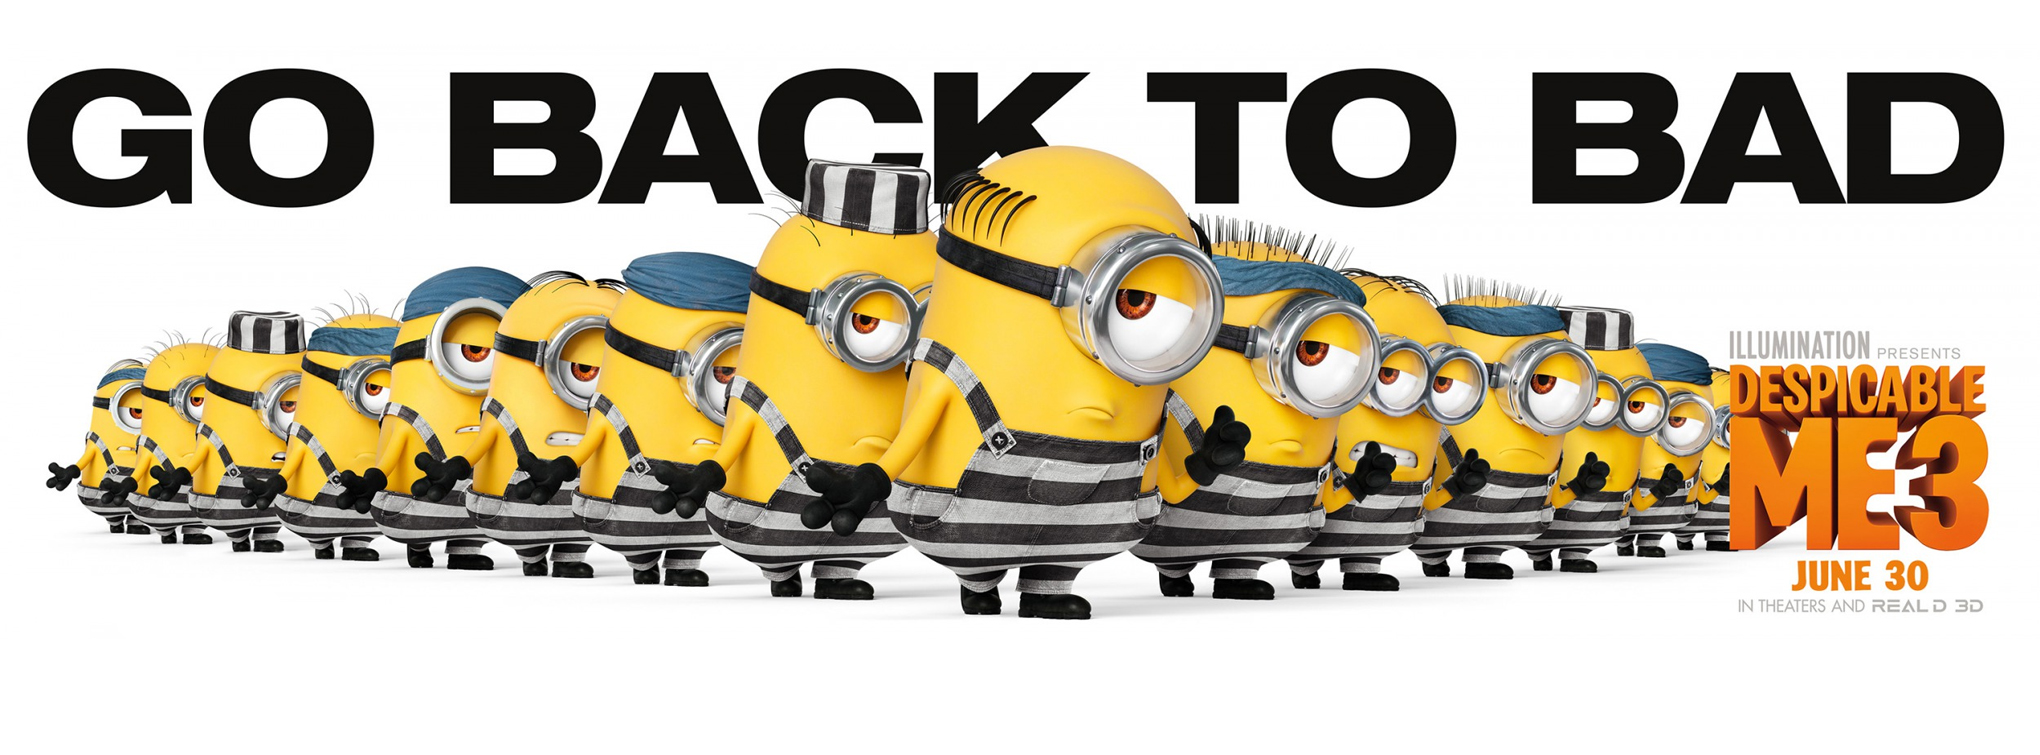 Despicable Me 3 - premiering everywhere Thursday, June 29!